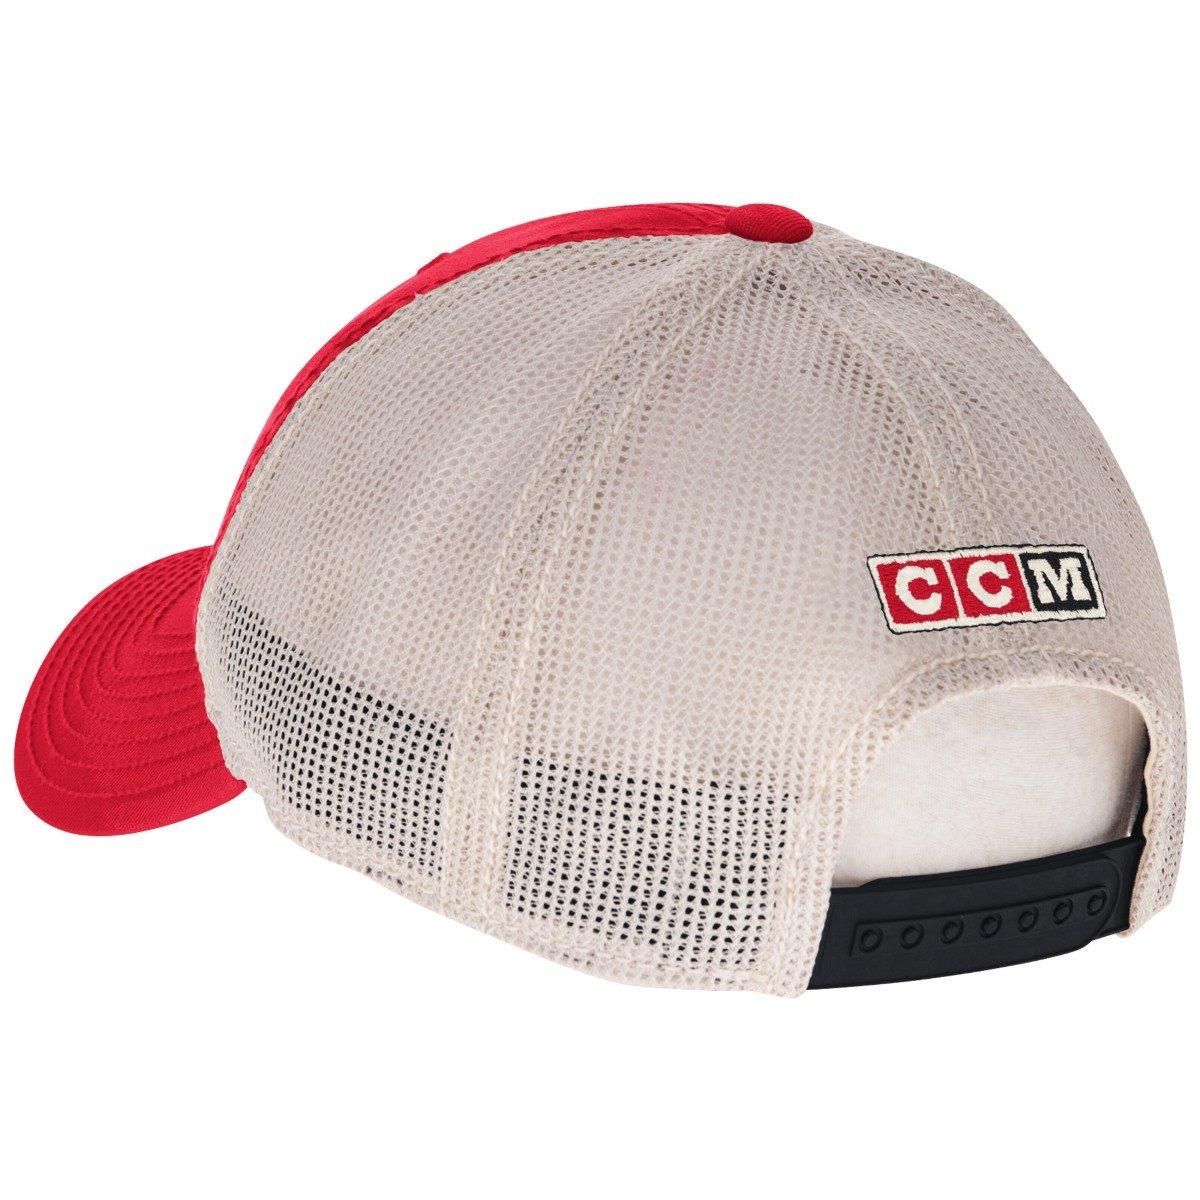 Amazon.com   Men s Chicago Blackhawks CCM Red White Trucker Meshback Slouch  Adjustable Snapback Hat   Sports   Outdoors 917cb1e7ff12